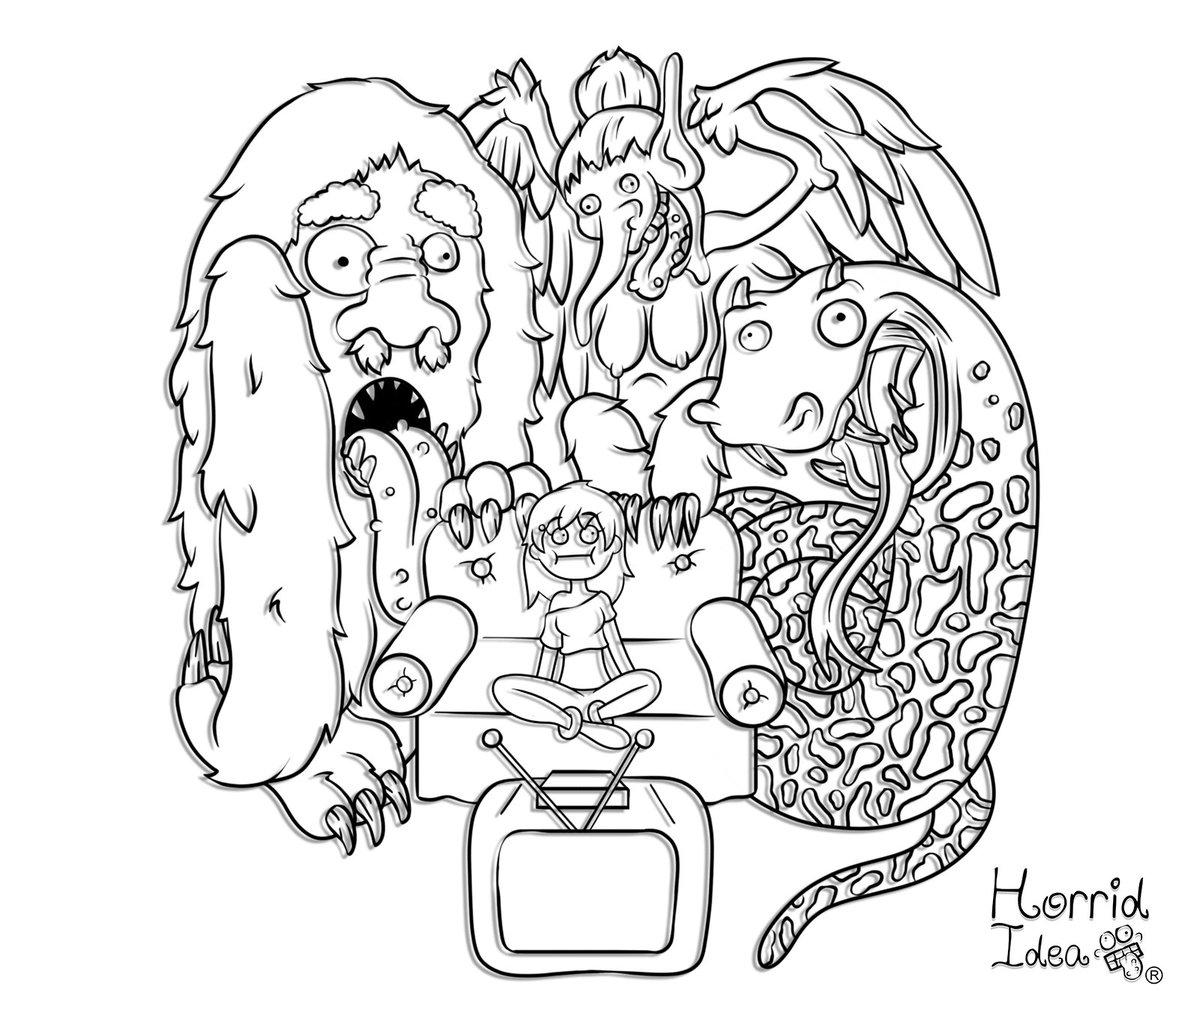 Eh....hola...que pex? #horrididea #monsters #monster #horror #horrorpicture #scary #bigfoot #basilisk #terror #illustration #ilustracion #watchingtv #horrormovie #giant #witch #helpme #drawing #ilovehorrorpic.twitter.com/33KaptR5fM